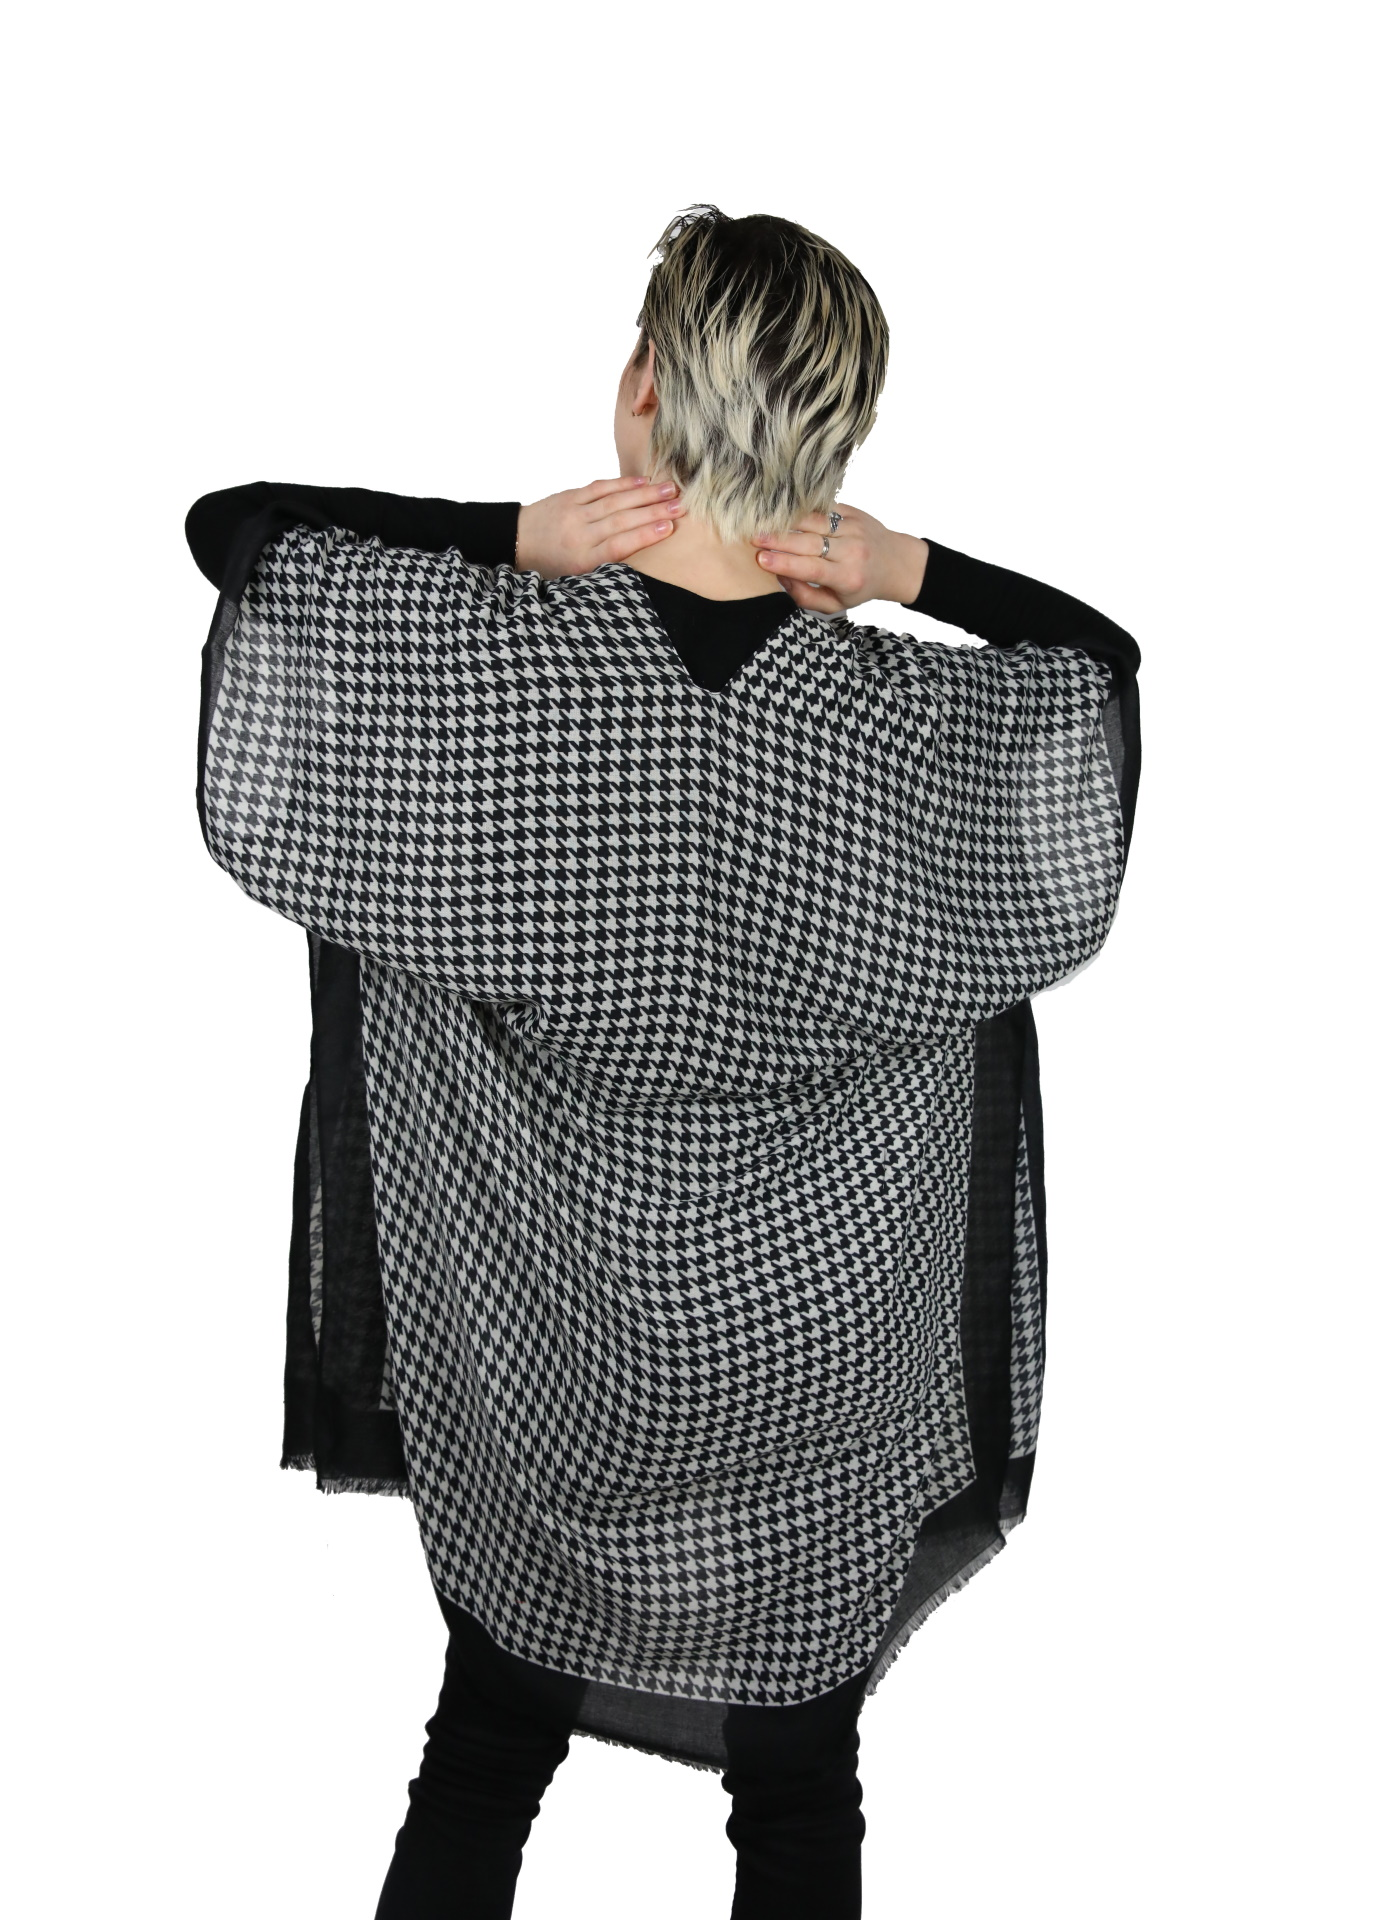 CLOTHES04 STOLA DONNA FOULARD CARDIGAN COPRISPALLE 1 1stAmerican elegante stola da donna foulard cardigan coprispalle